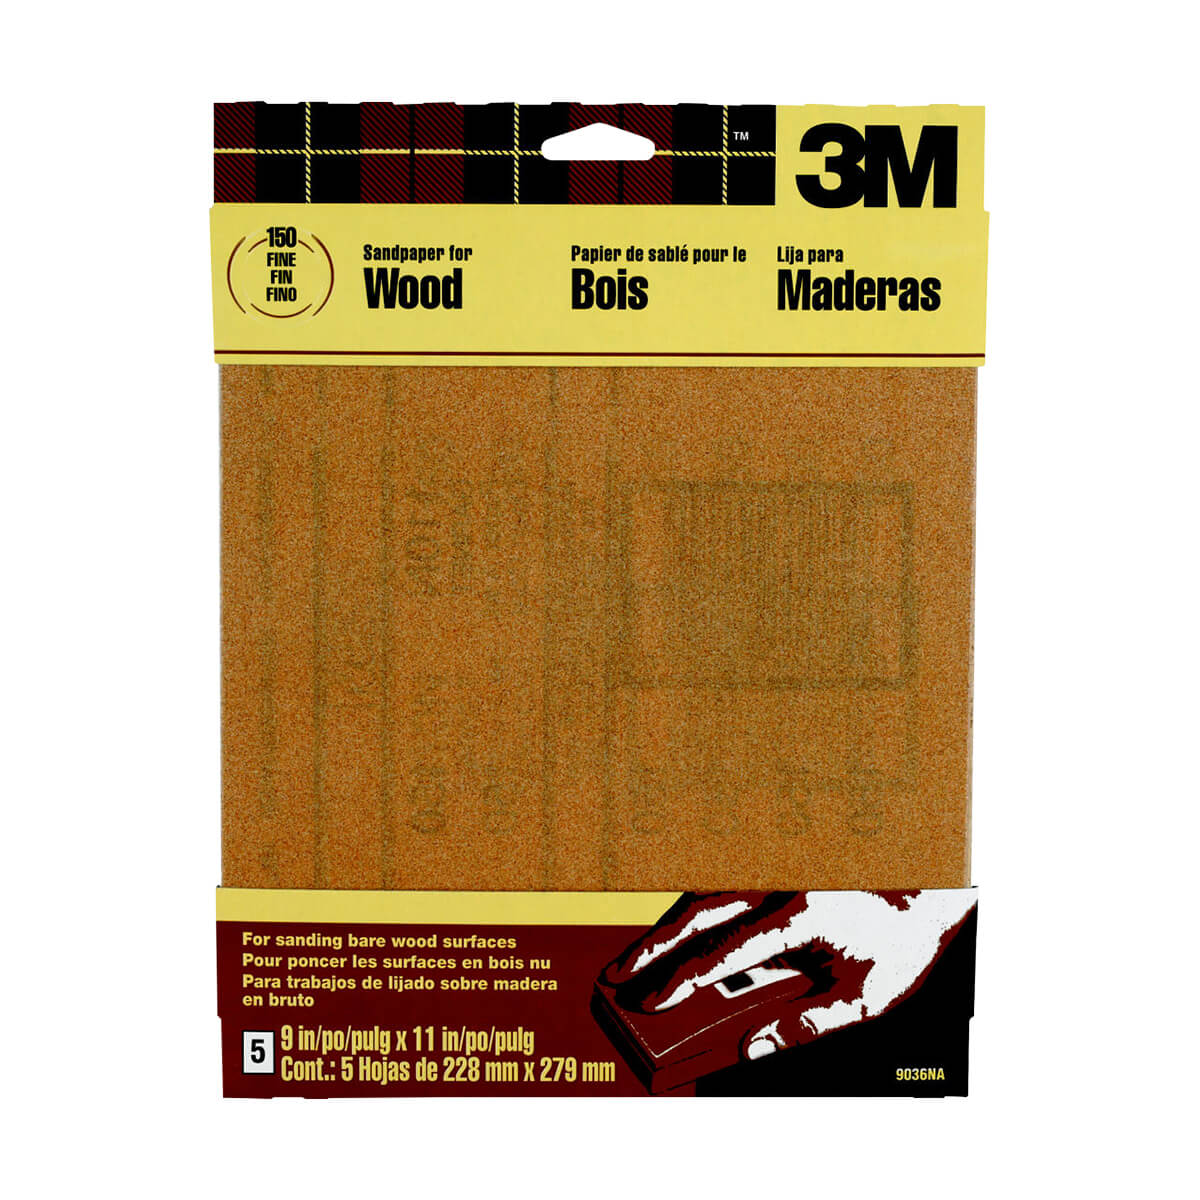 3M Garnet Sandpaper - 5 pack, 150 Grit